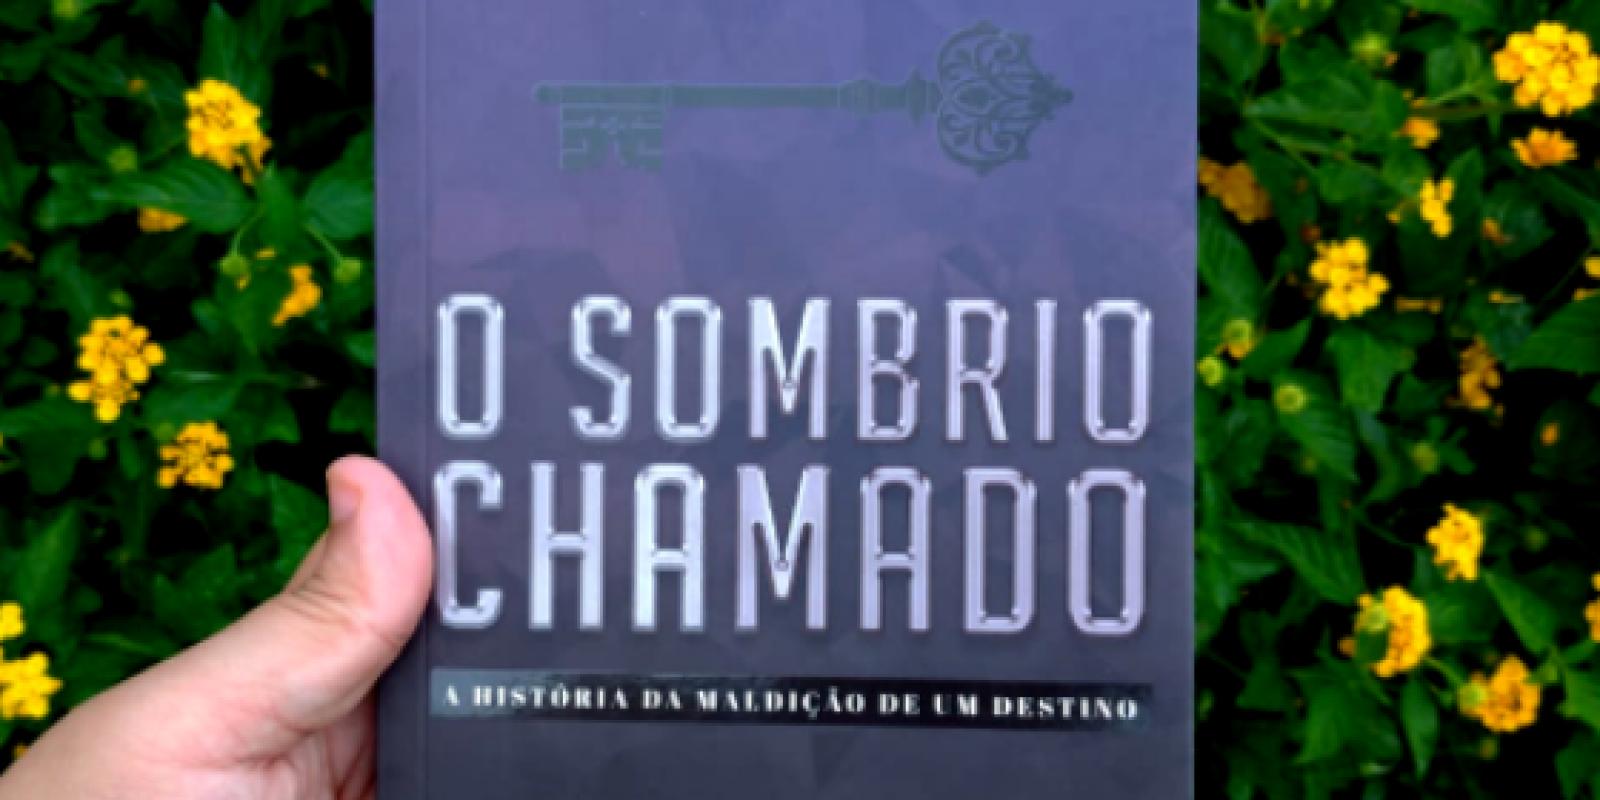 [O SOMBRIO CHAMADO - KELLY SHIMOHIRO]